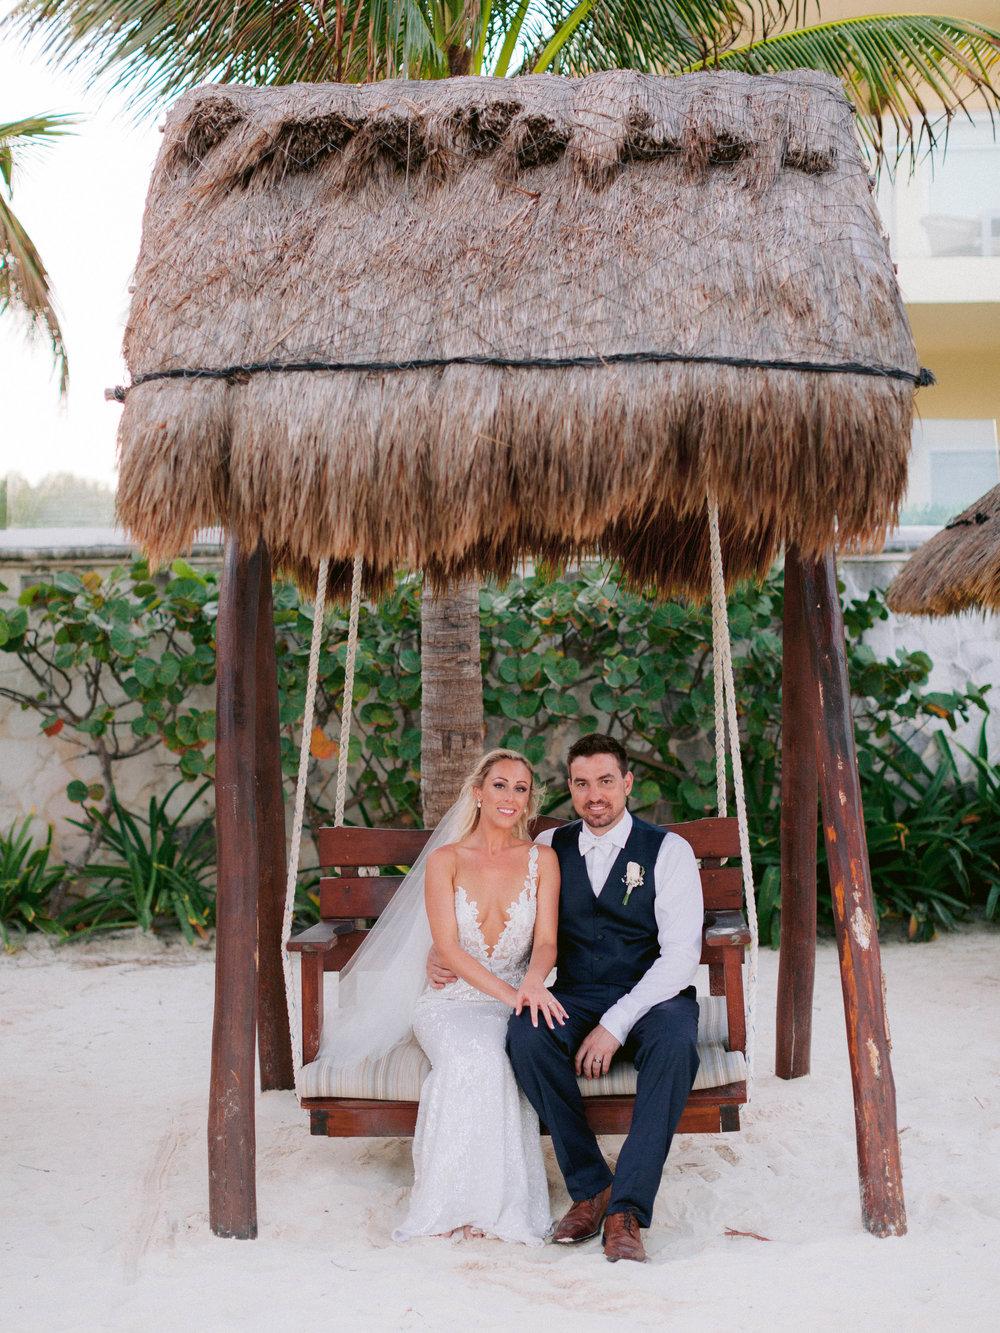 Kim_Jeff_Cancun Wedding_Portraits_Kurtz_Orpia (164 of 178).jpg